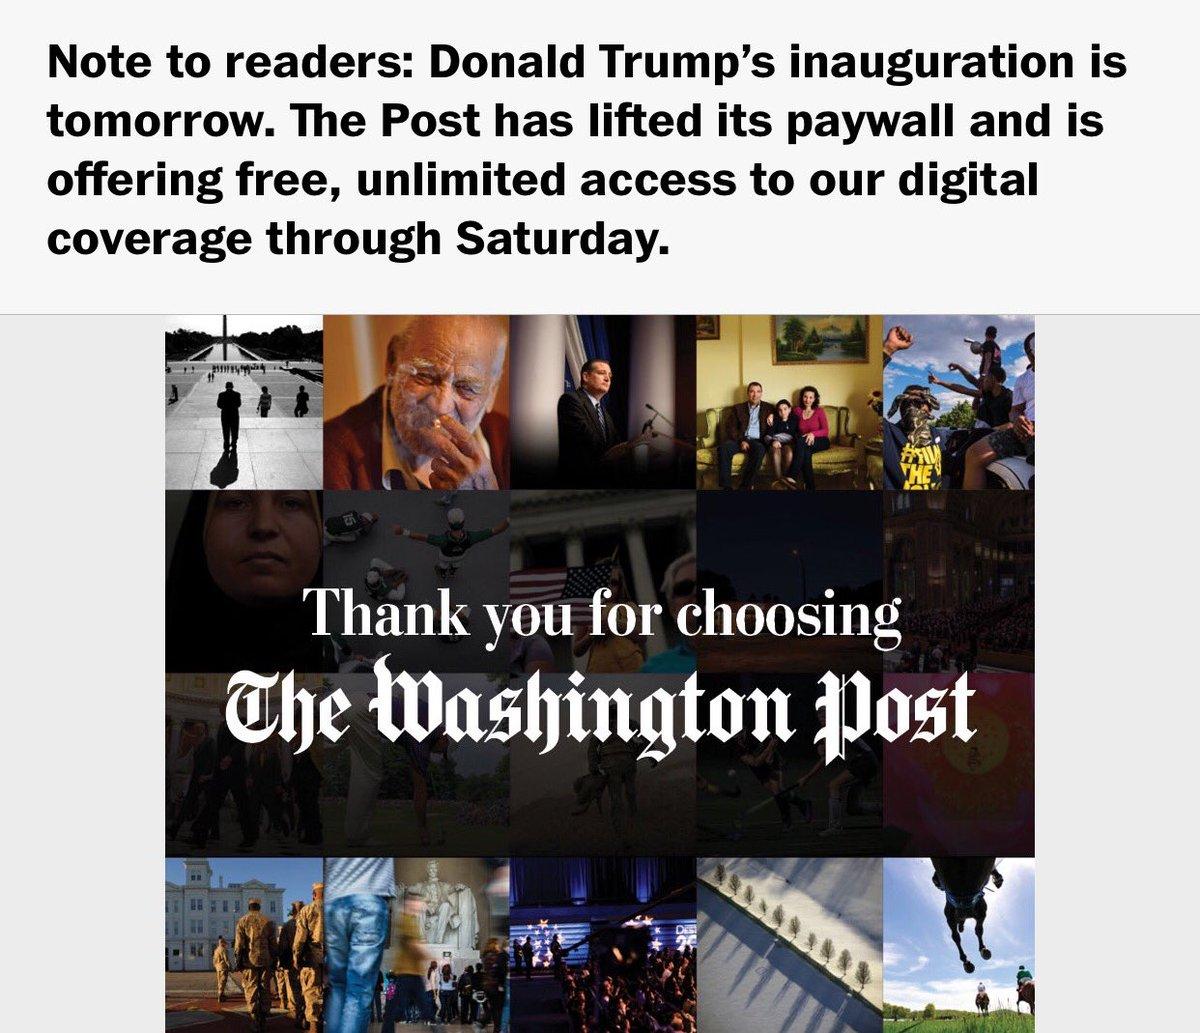 Enjoy unlimited free access to @washingtonpost through Saturday. https://t.co/04D5lOYVU6